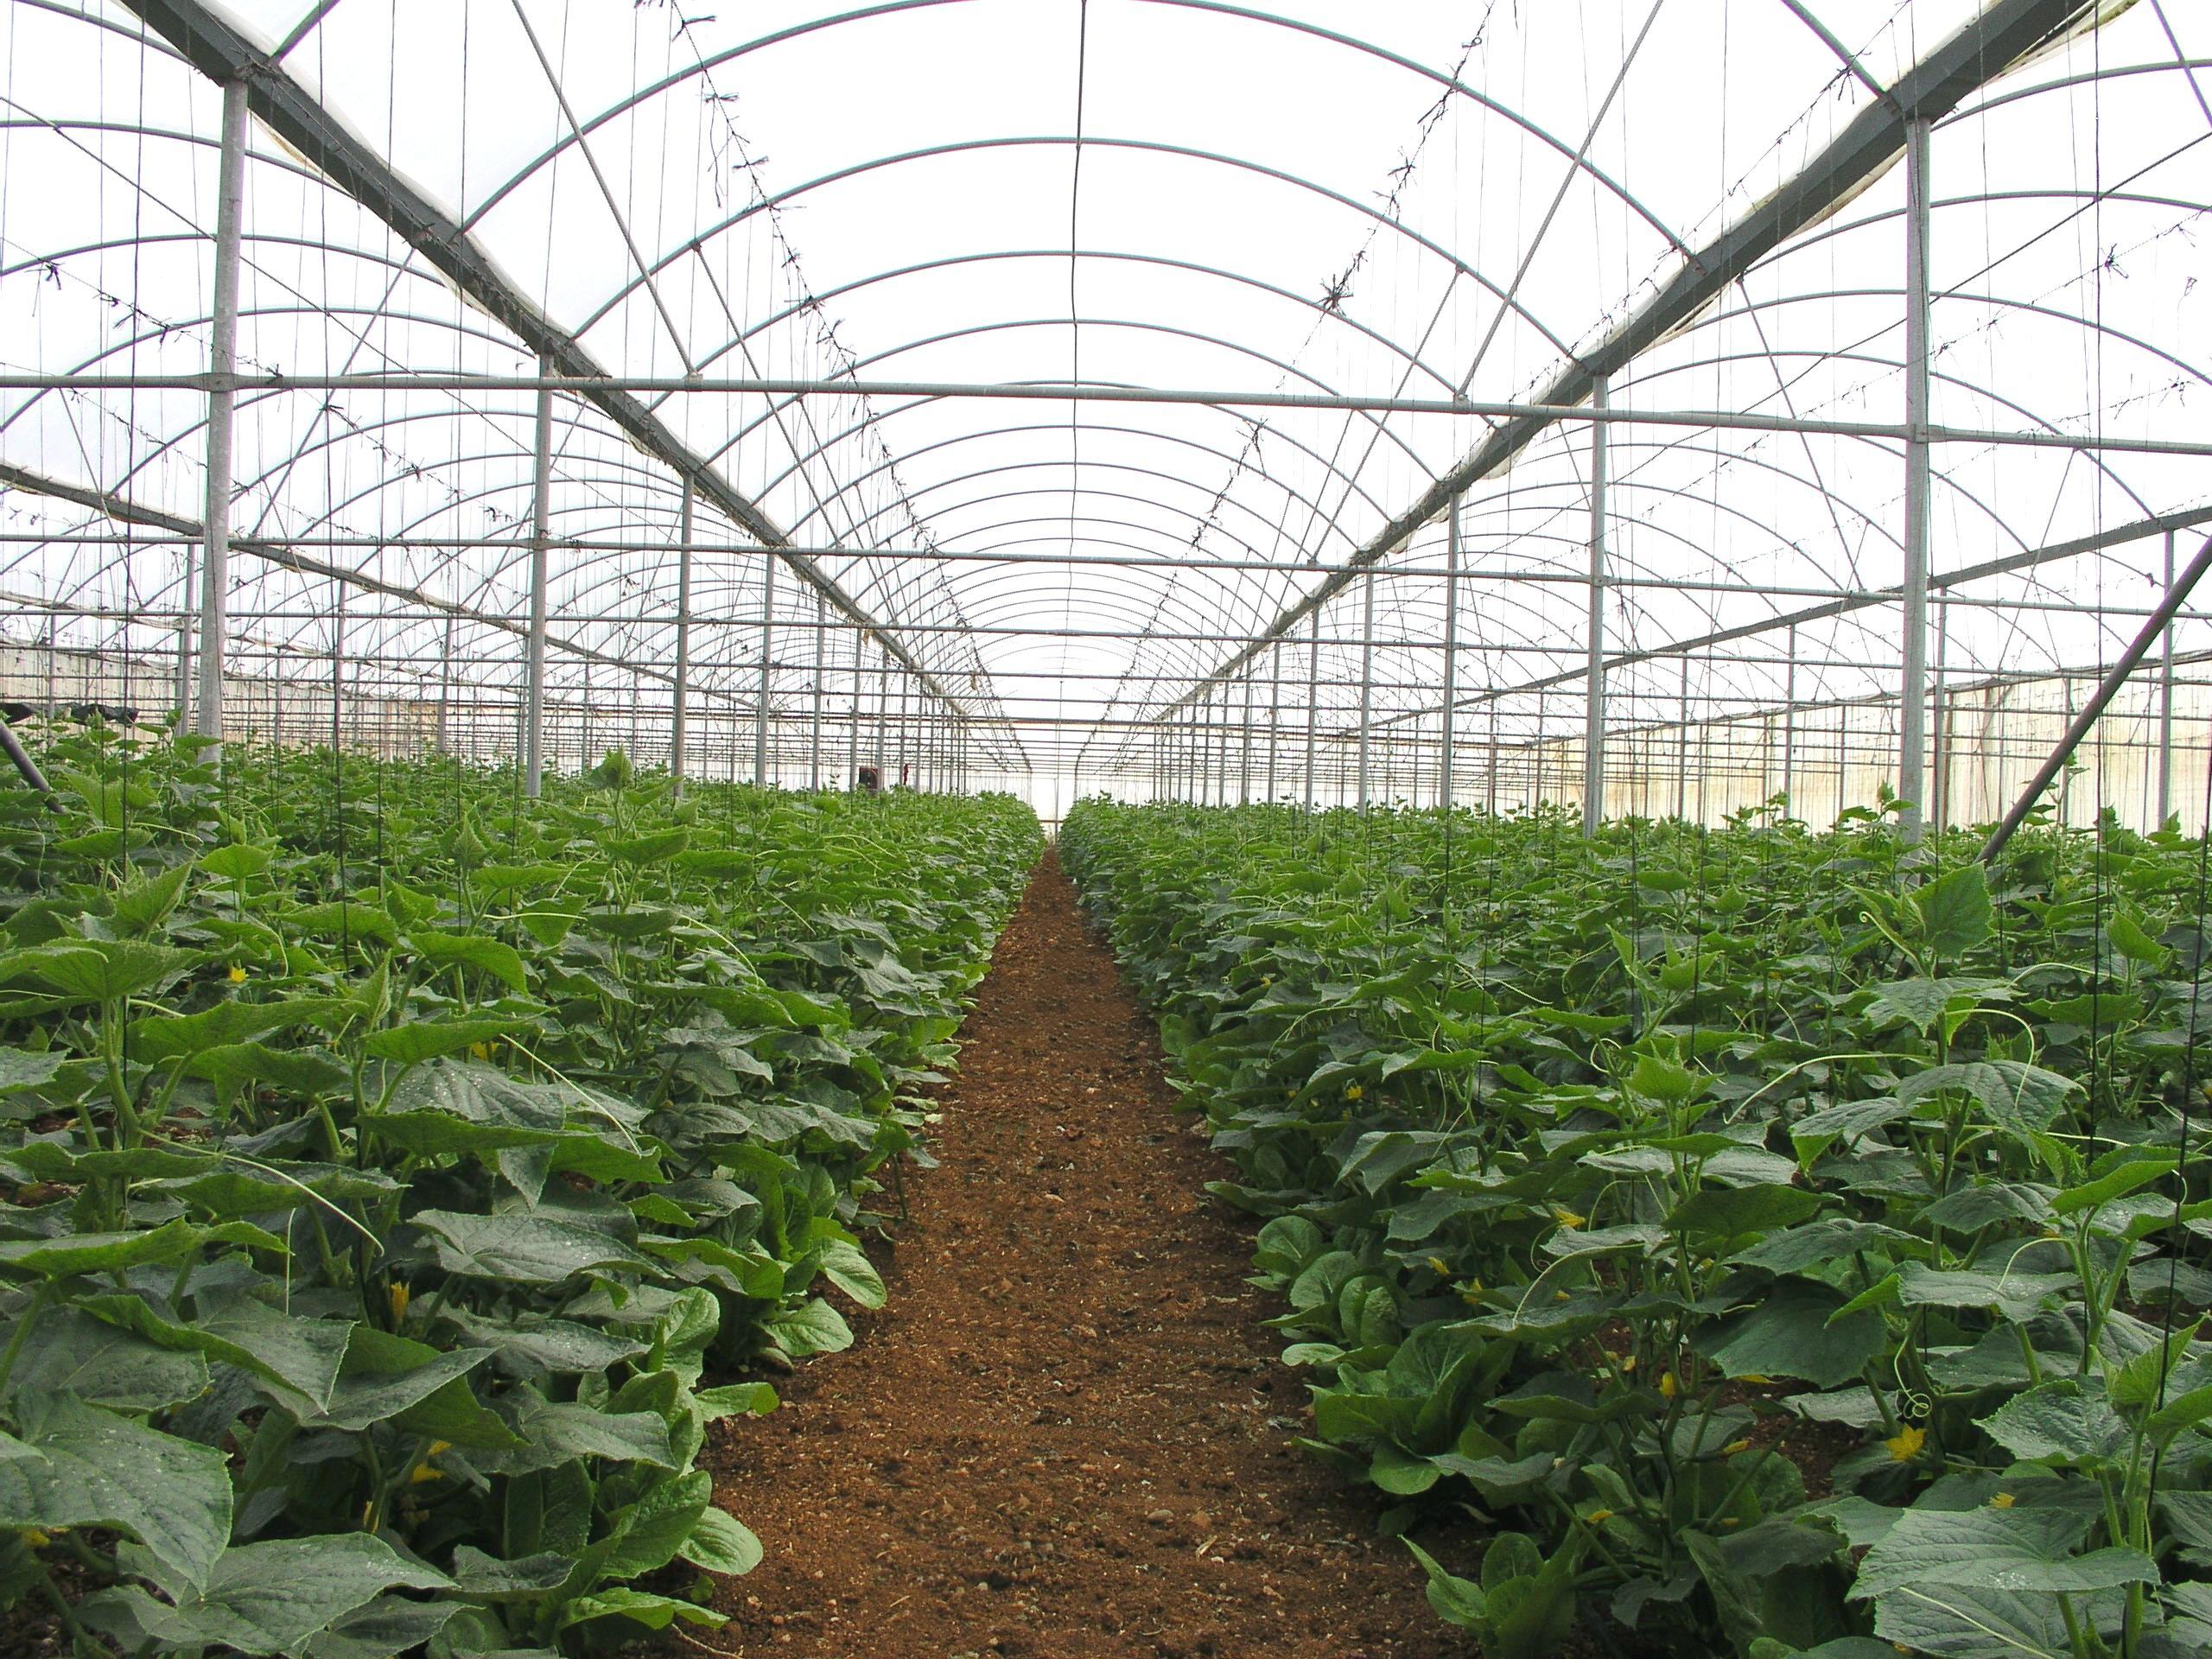 KRITIFIL® greenhouse filmsLifetime